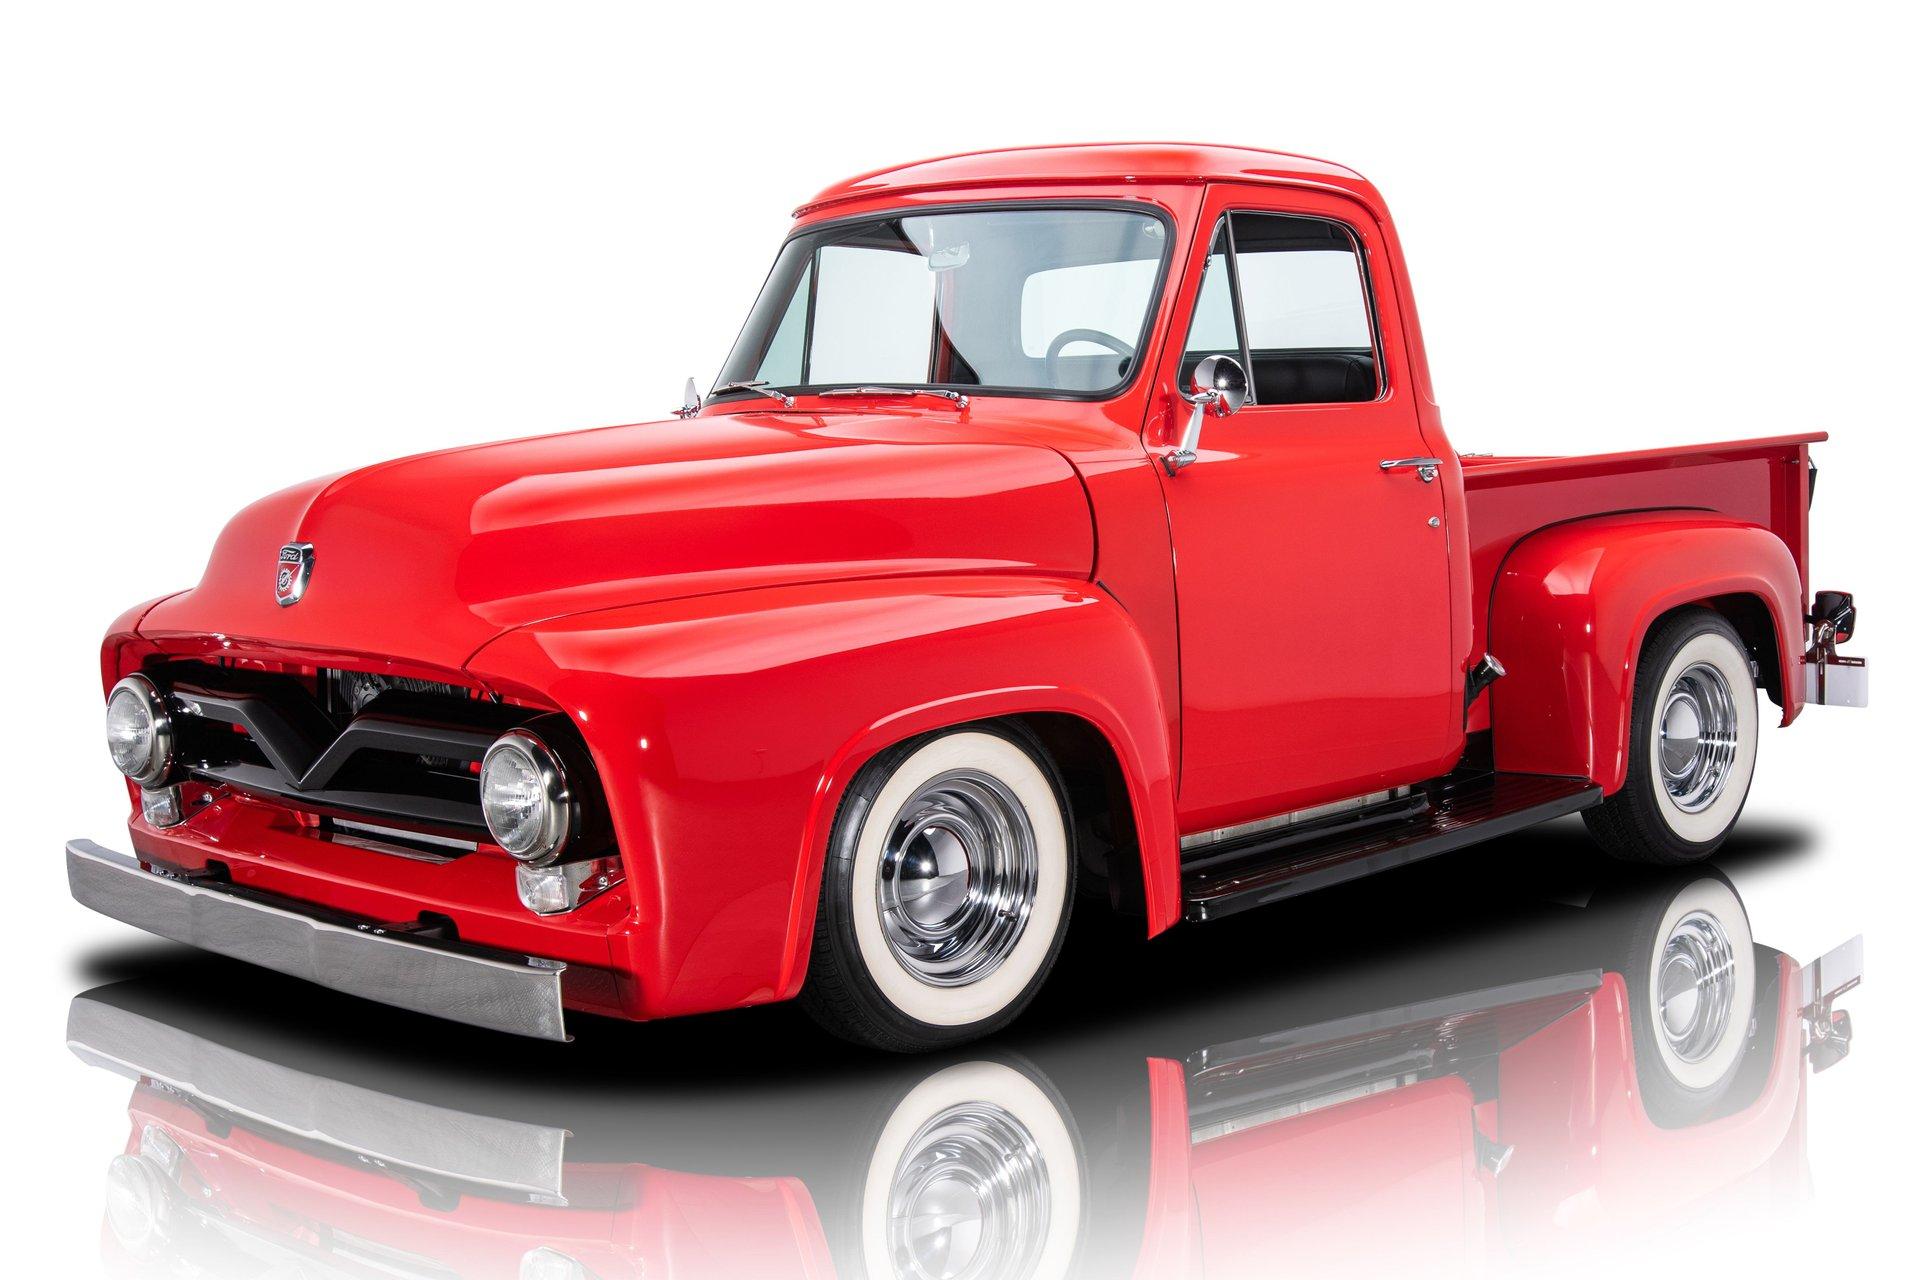 1955 ford f200 pickup truck